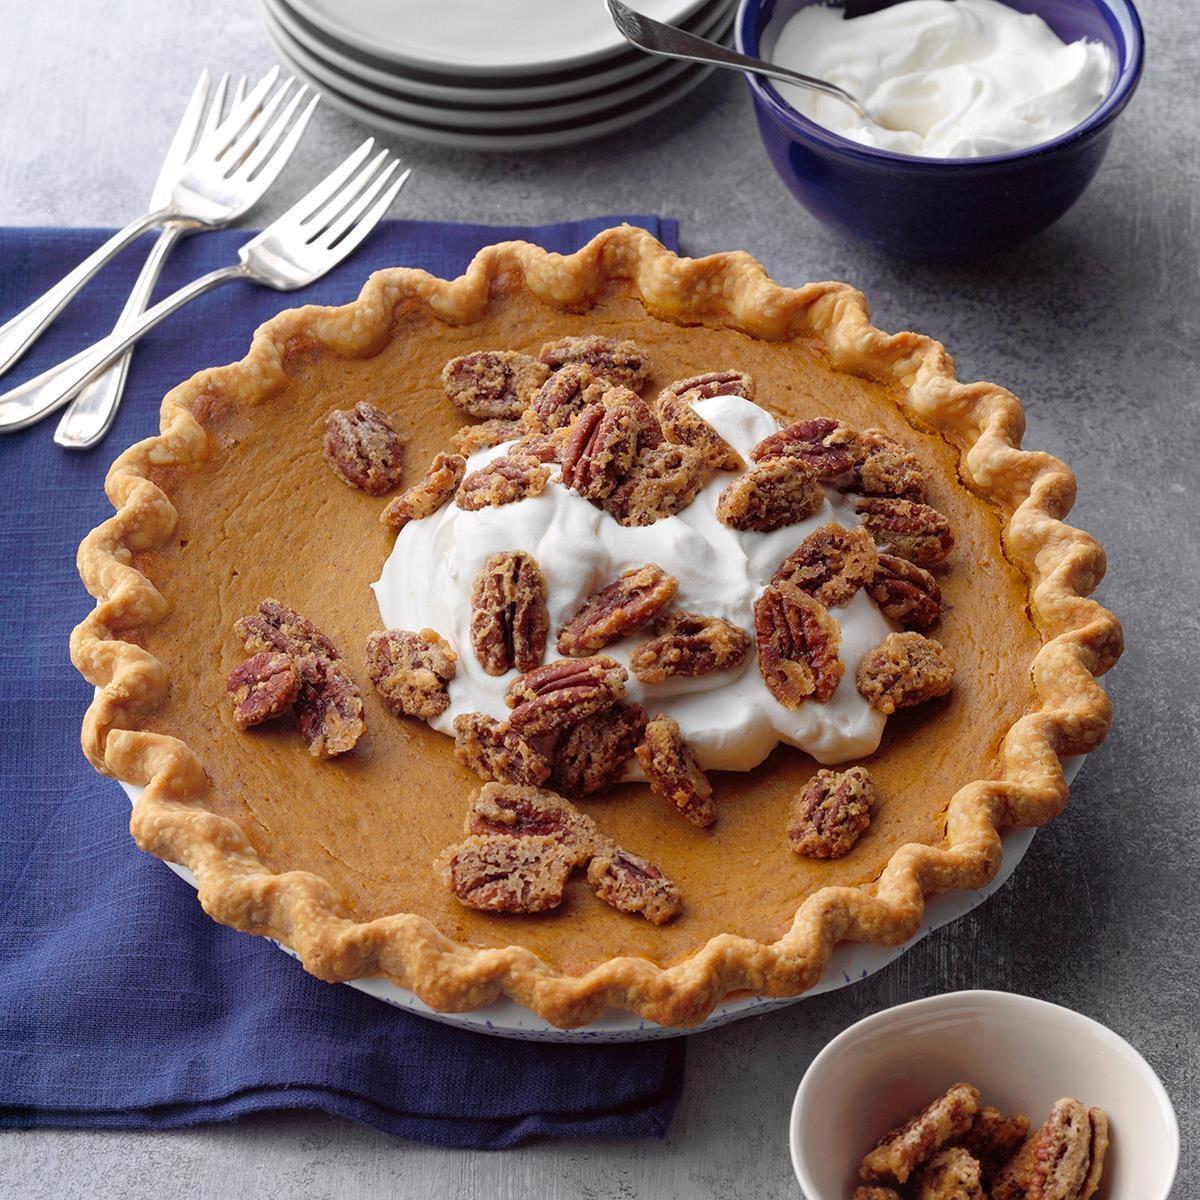 Thanksgiving Desserts Pecan Pie Pumpkin Pie More: Pumpkin-Sweet Potato Pie With Sugared Pecans Recipe